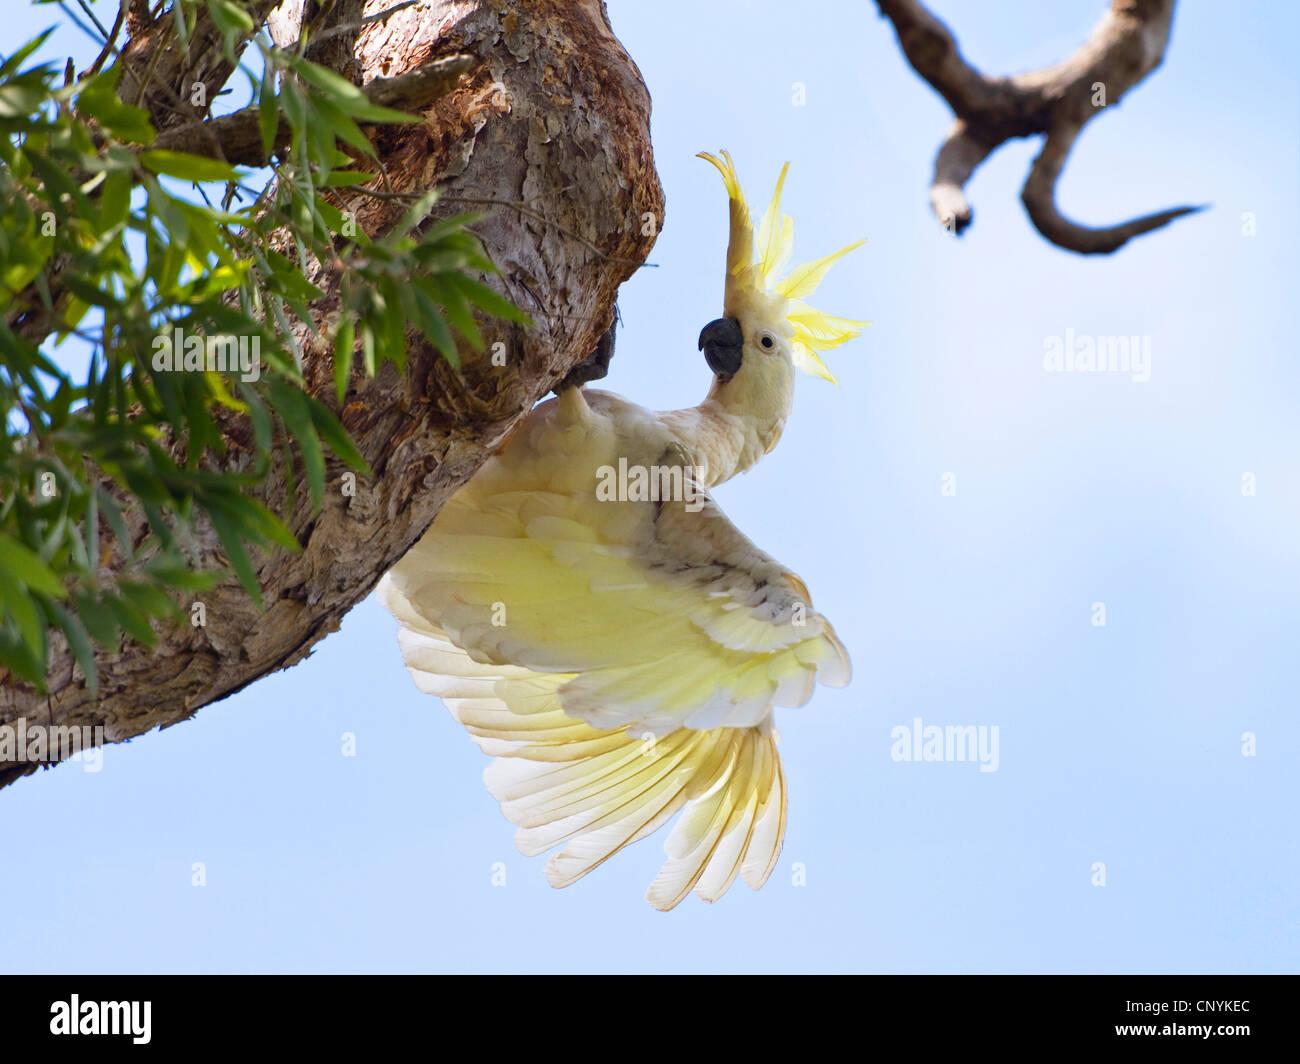 sulphur-crested cockatoo (Cacatua galerita), on a branch, Australia, Queensland, Cape York peninsula, Iron Range - Stock Image